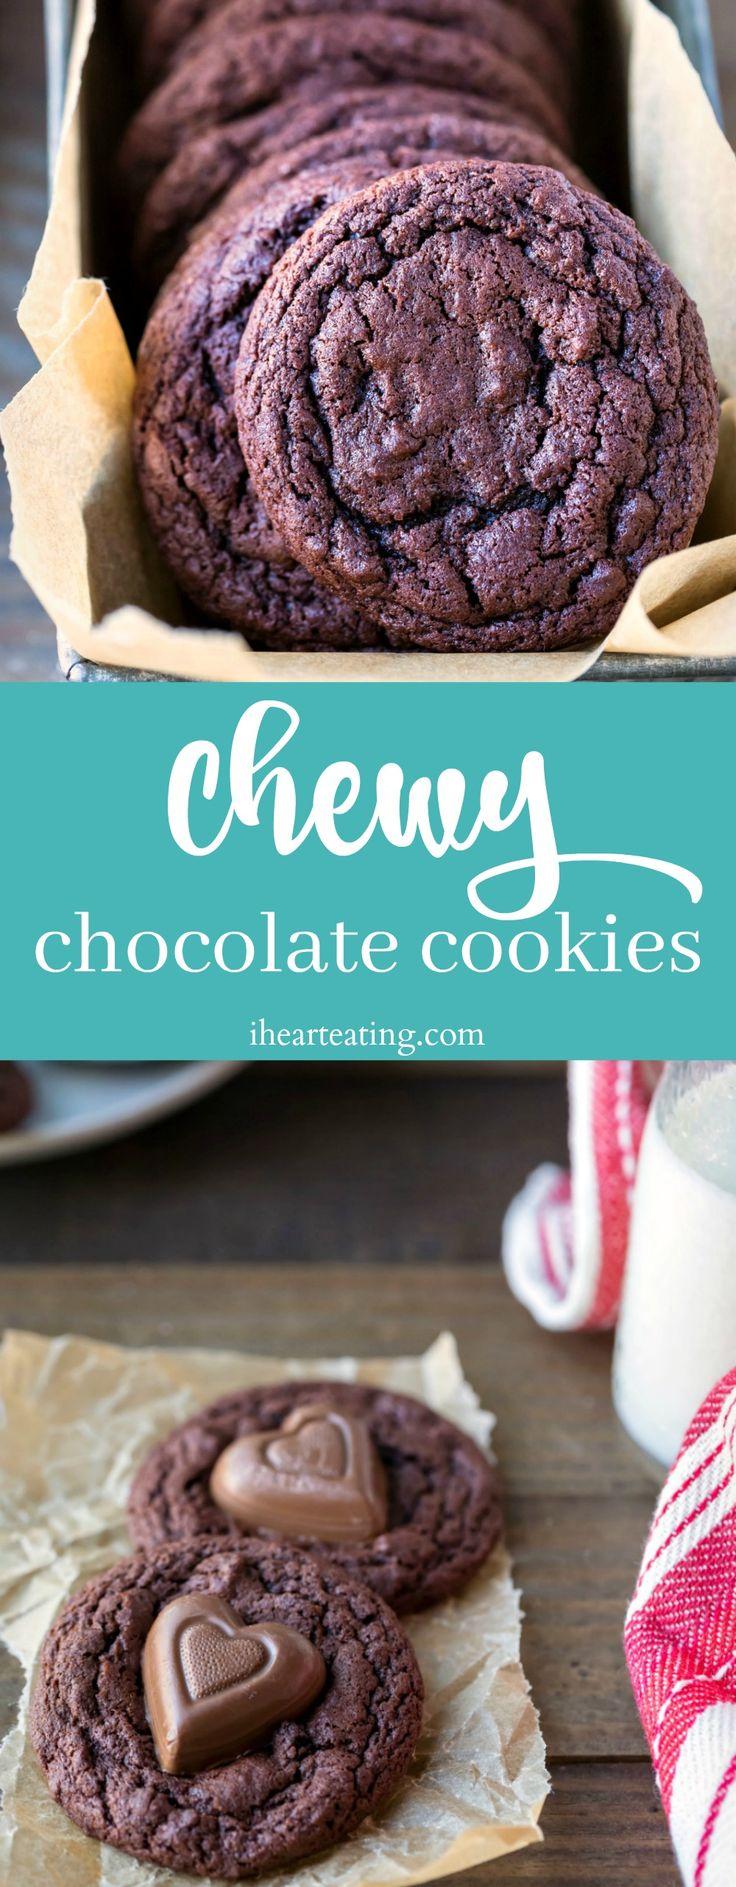 1867 best cookies images on Pinterest   Chocolate candies, Cookies ...